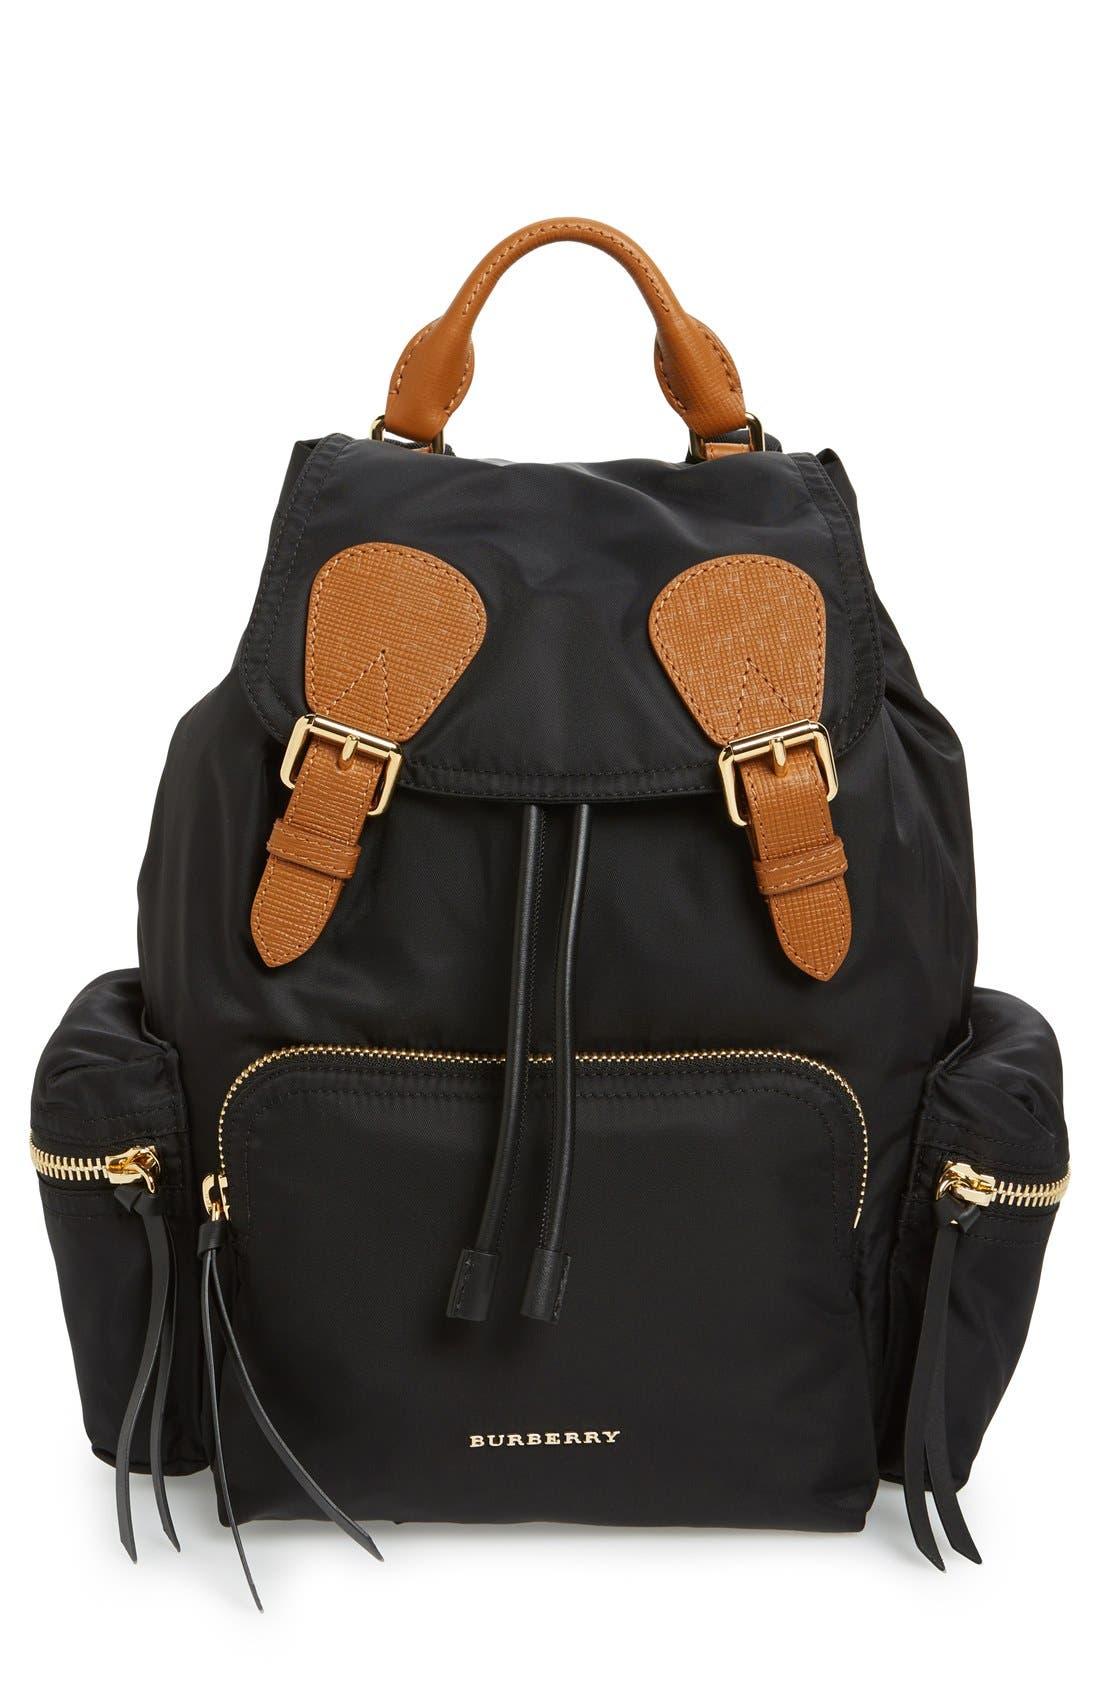 'medium Runway Rucksack' Nylon Backpack by Burberry